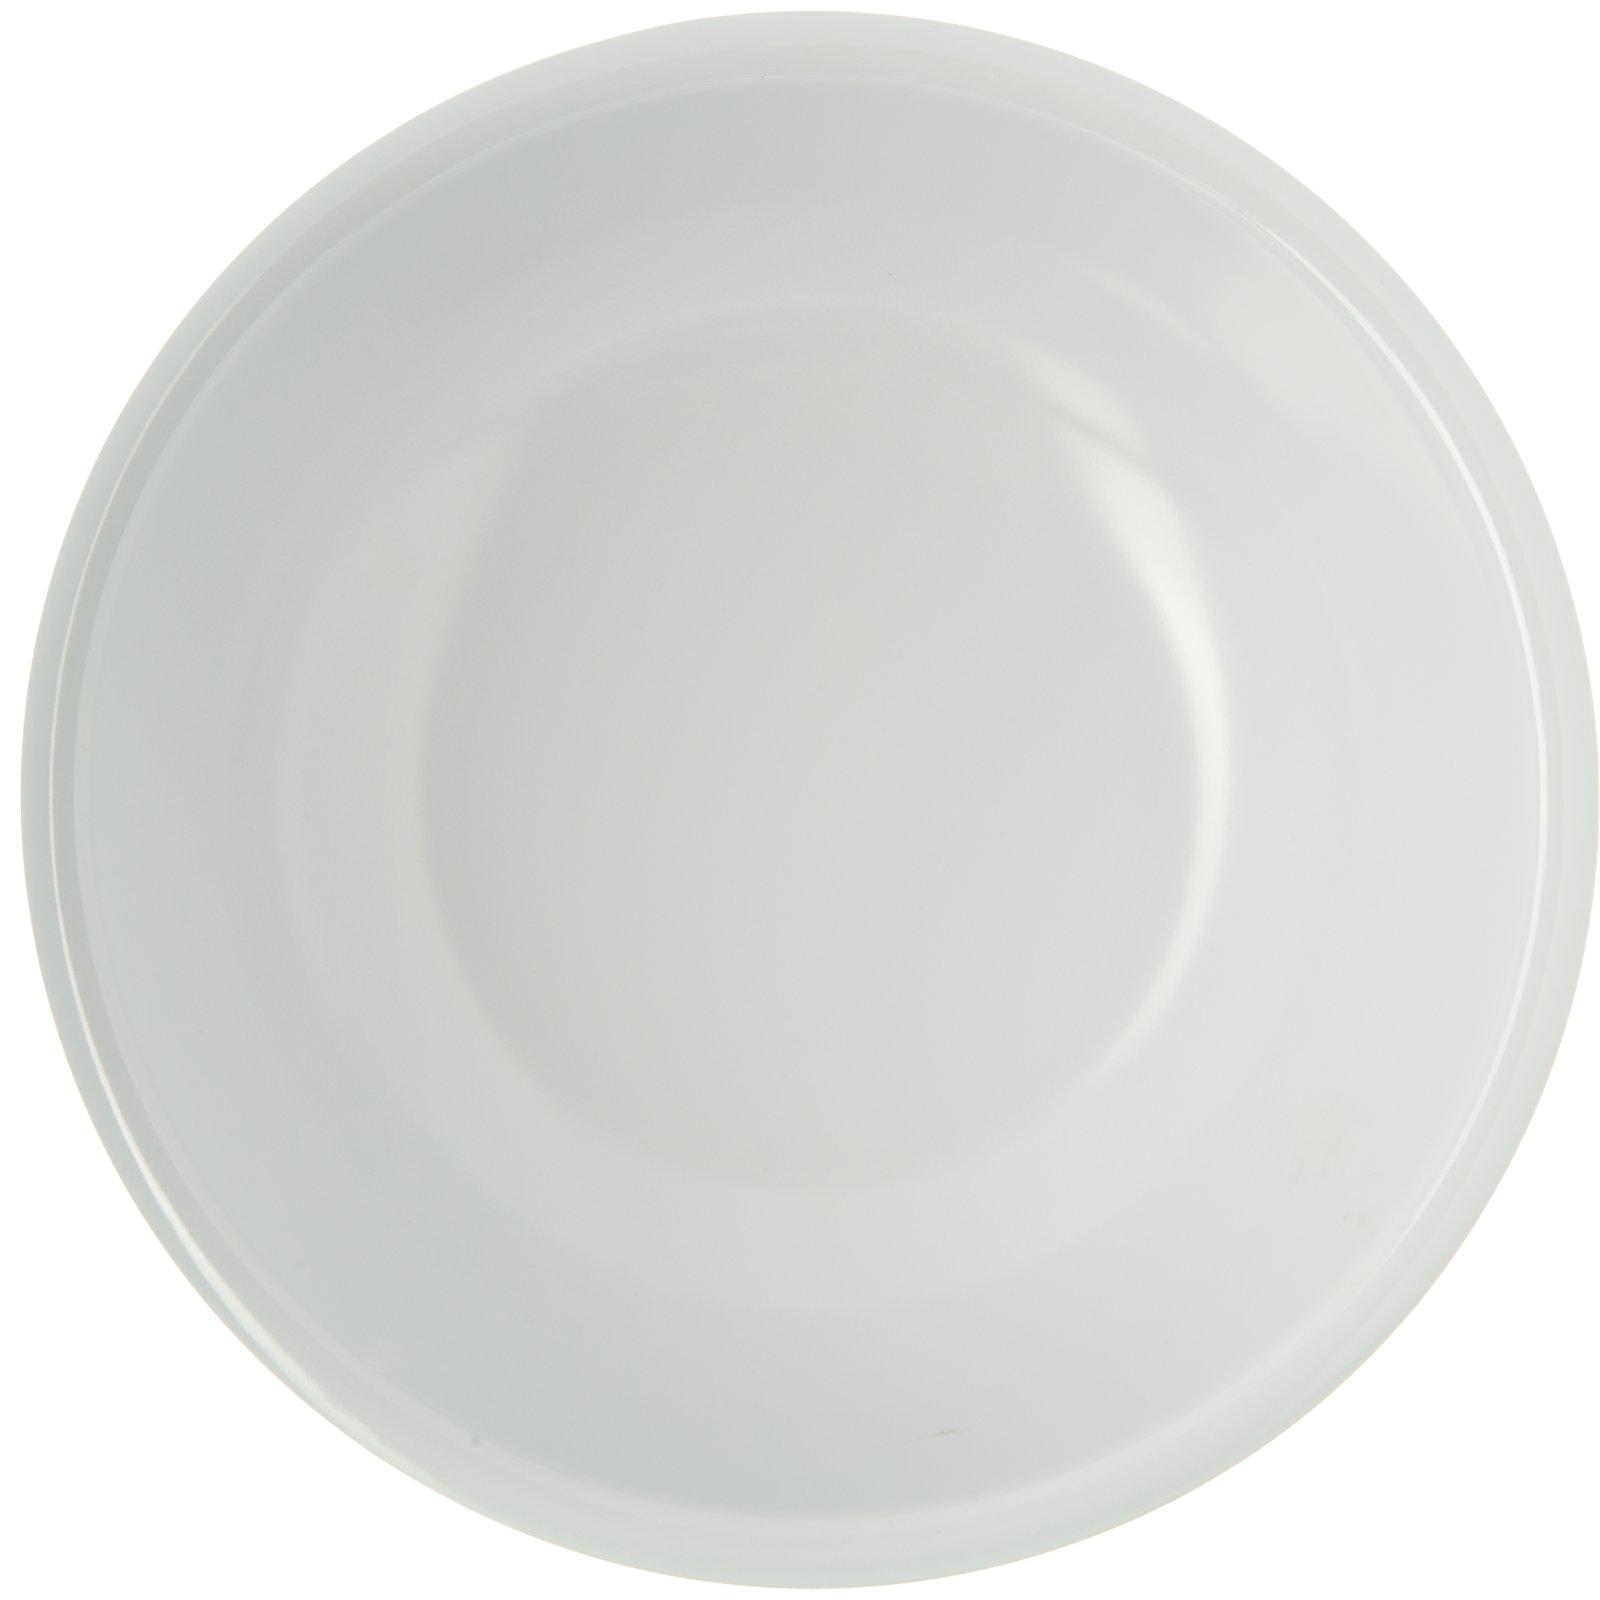 593302 Epicure Melamine Soup Salad Broth Bowl 32 Oz White Carlisle Foodservice Products